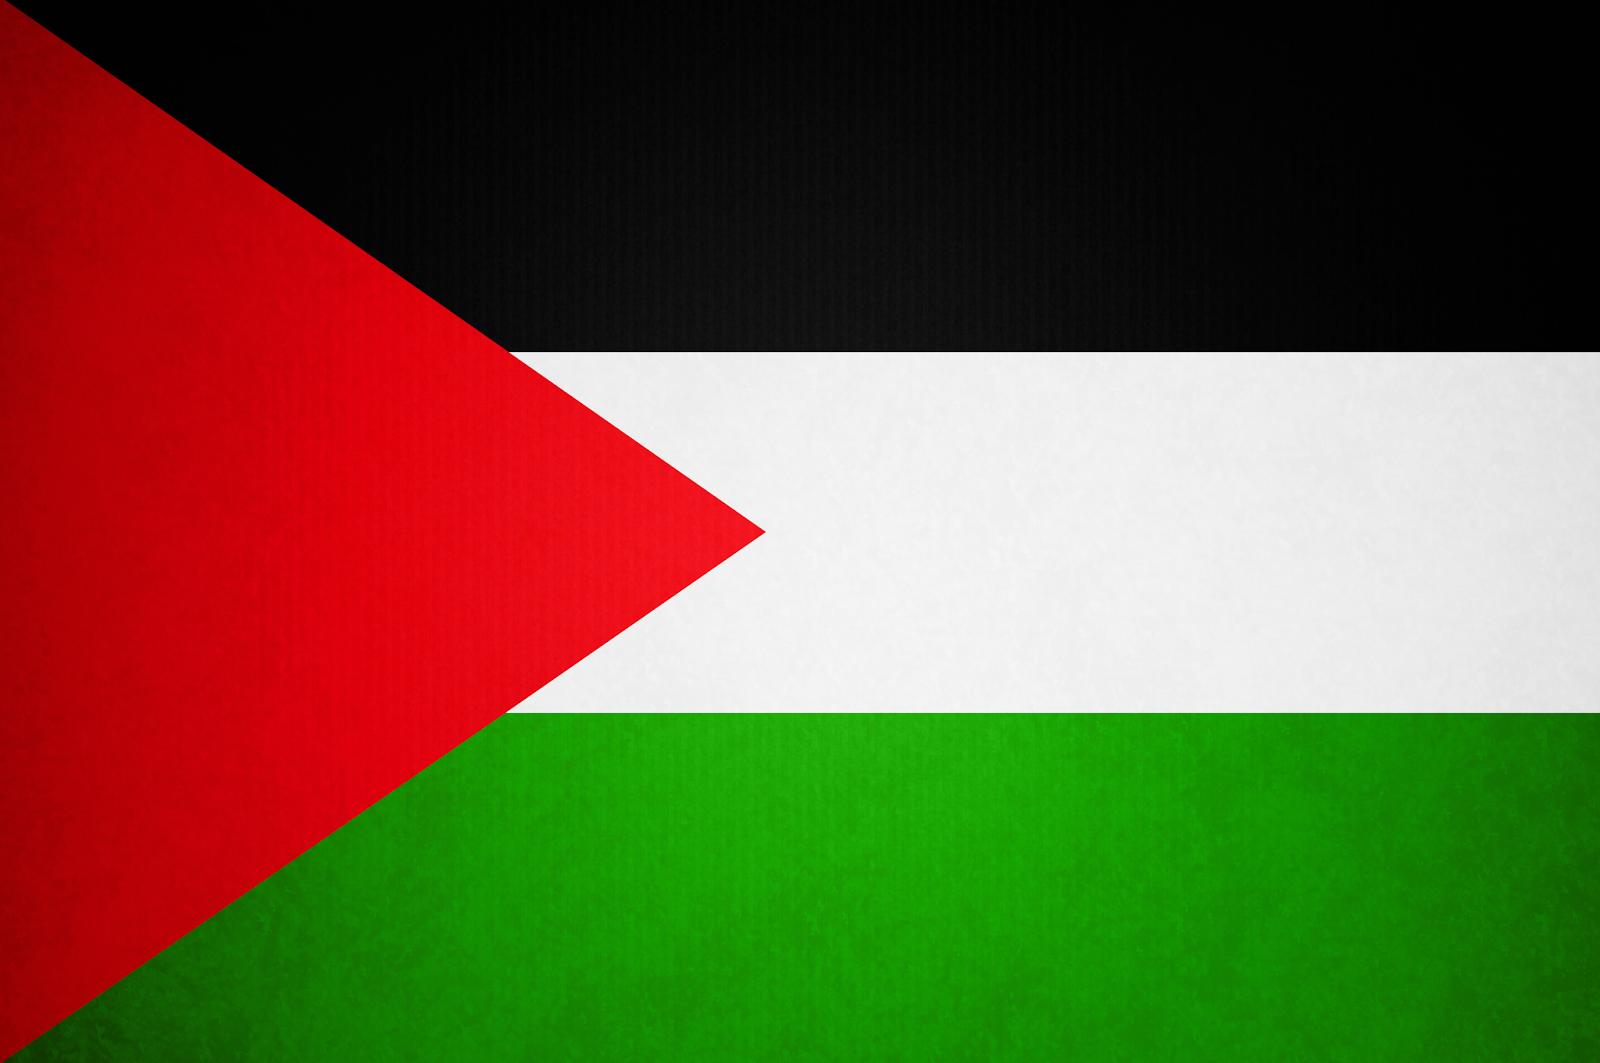 Palestine flag png hd pictures 3000x4515 px Png Vectors Photos 1600x1063